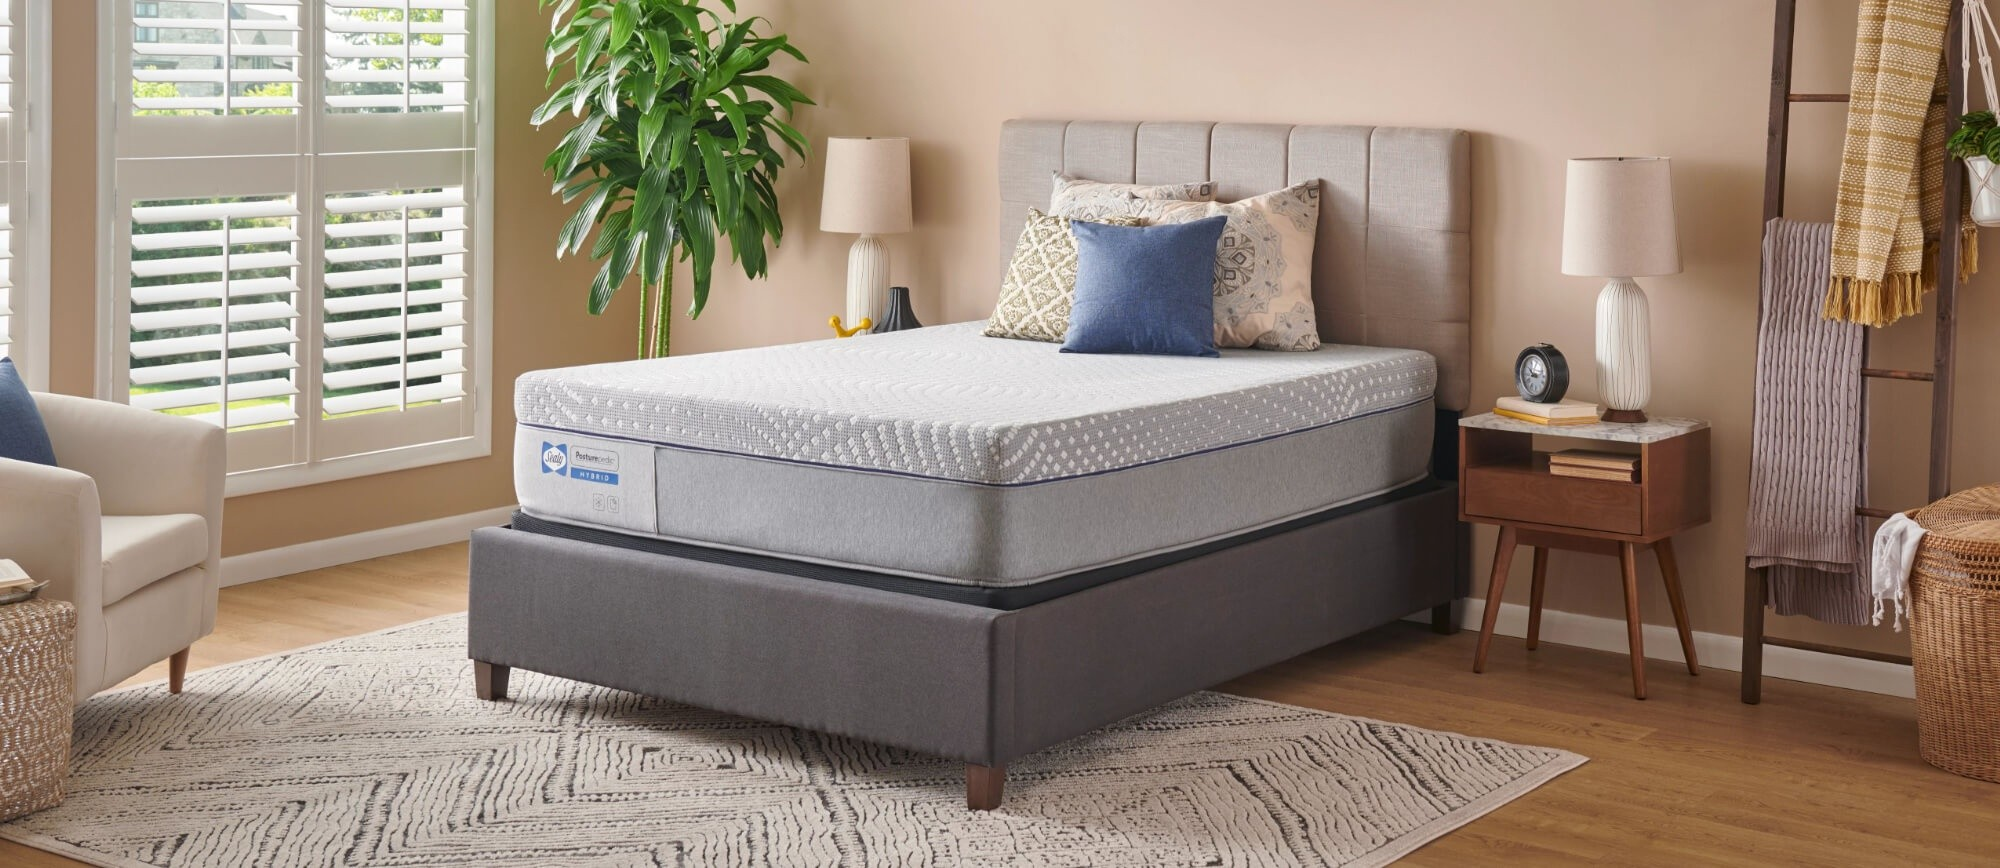 posturepedic hybrid mattress